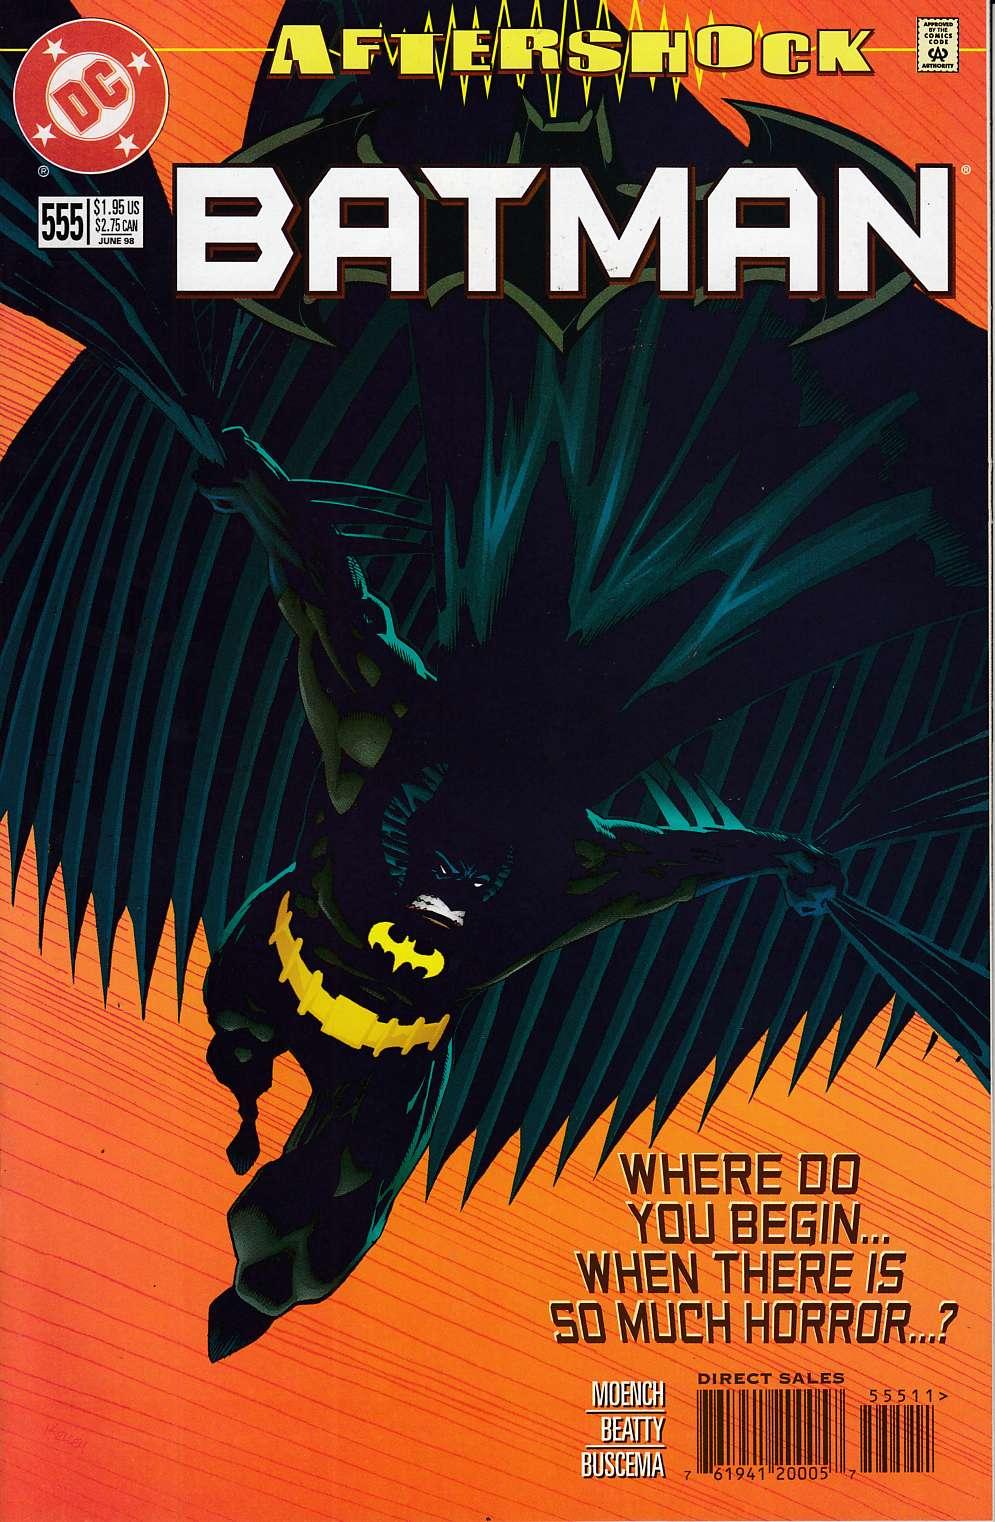 BATMAN #560 VERY FINE// NEAR MINT 1998 DC COMICS